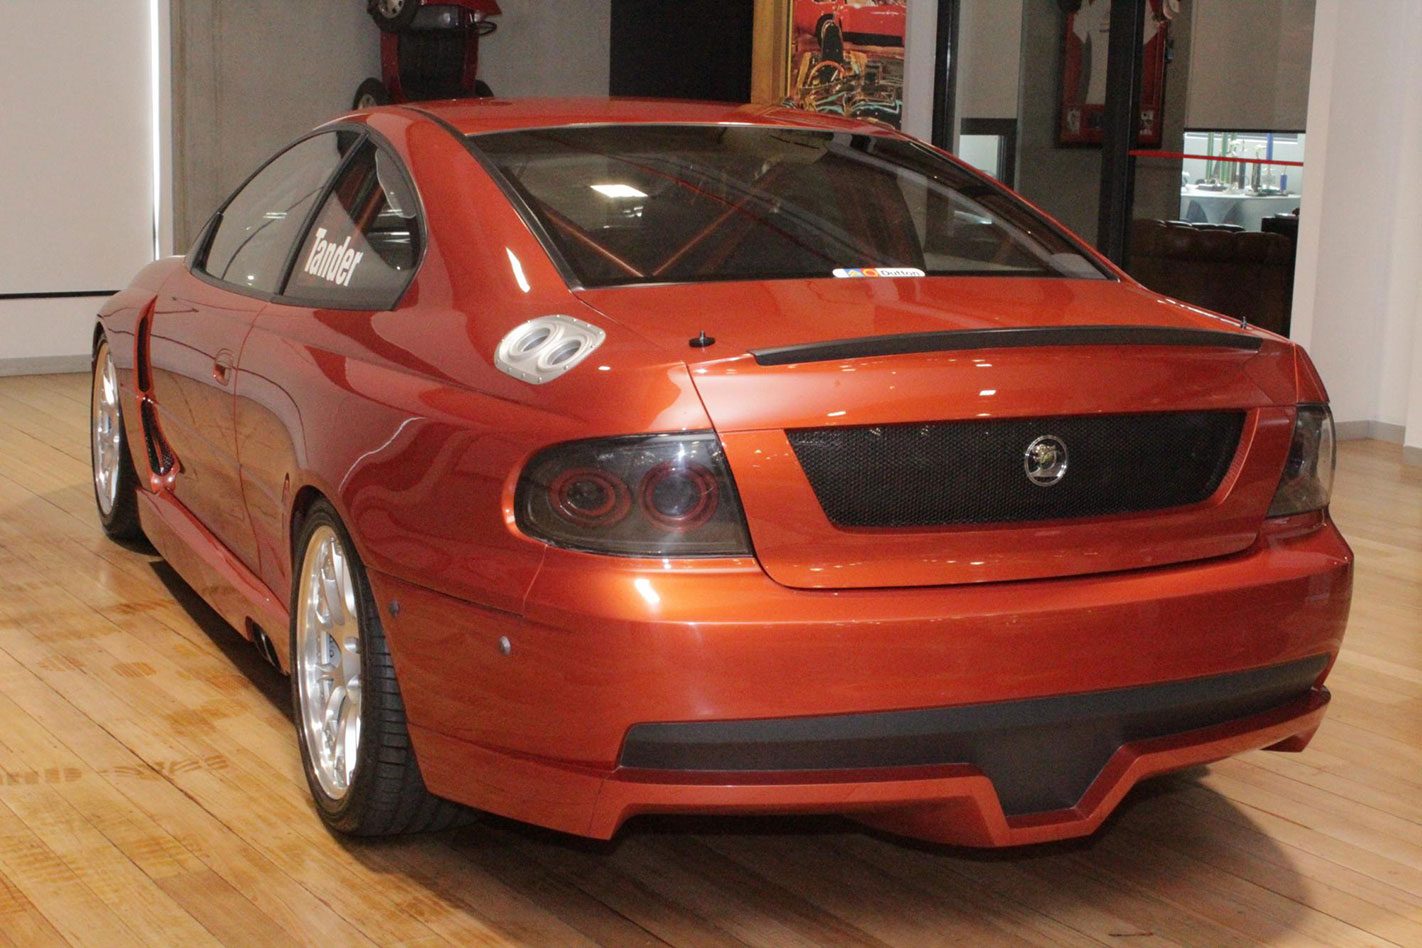 HSV GTS-R rear